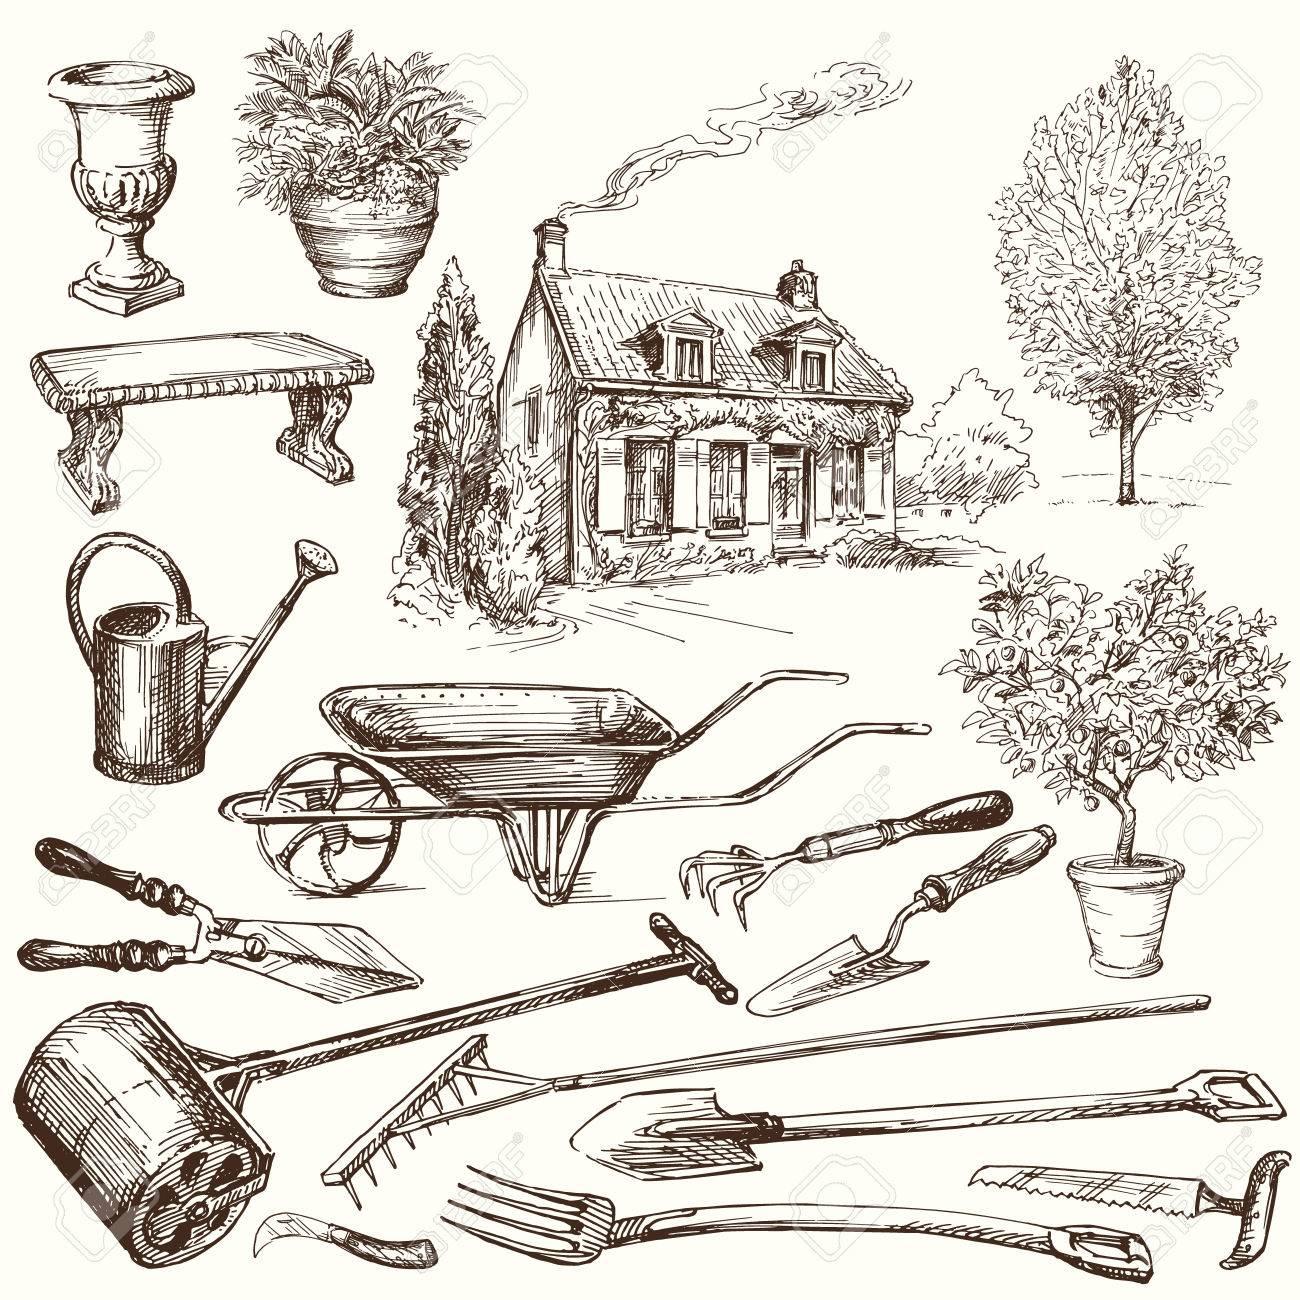 gardening, garden tools - hand drawn collection - 36853309